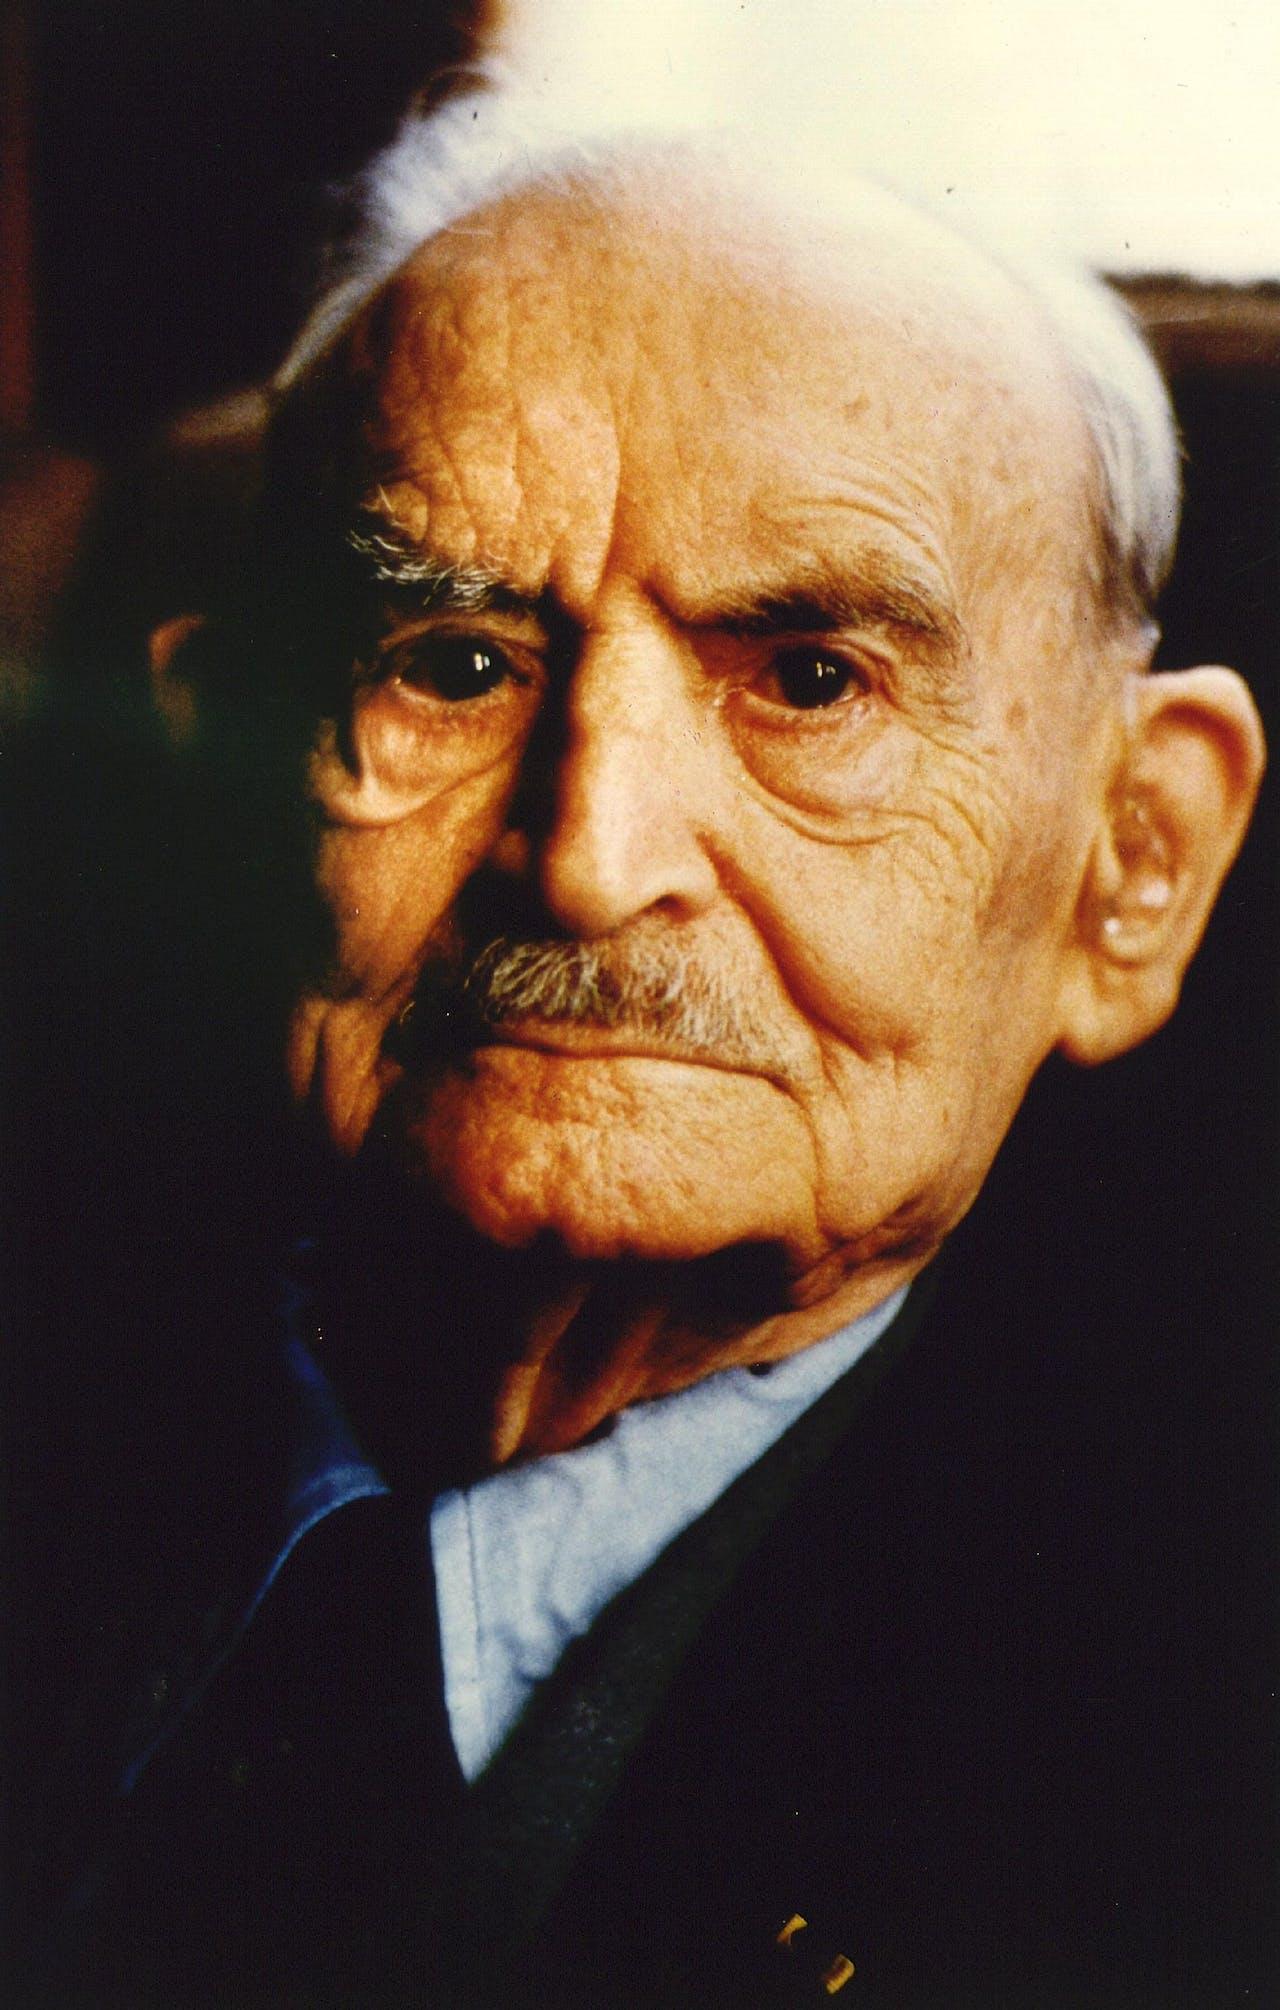 Dr. Willem Drees, grondlegger van de AOW